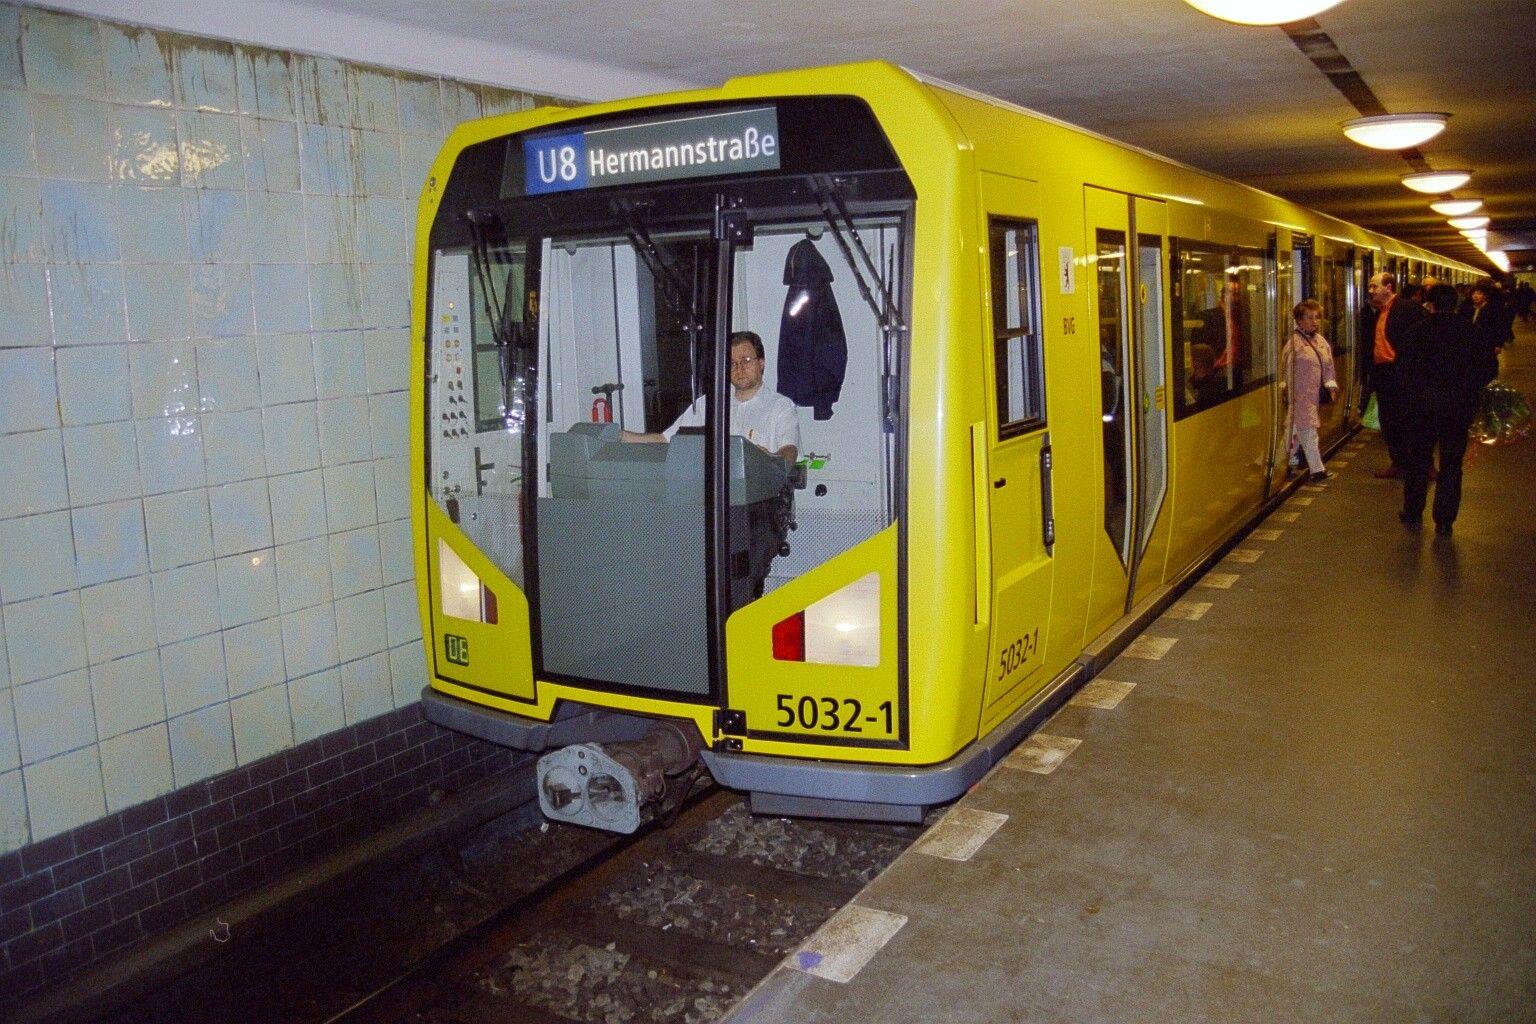 U-Bahn 5032